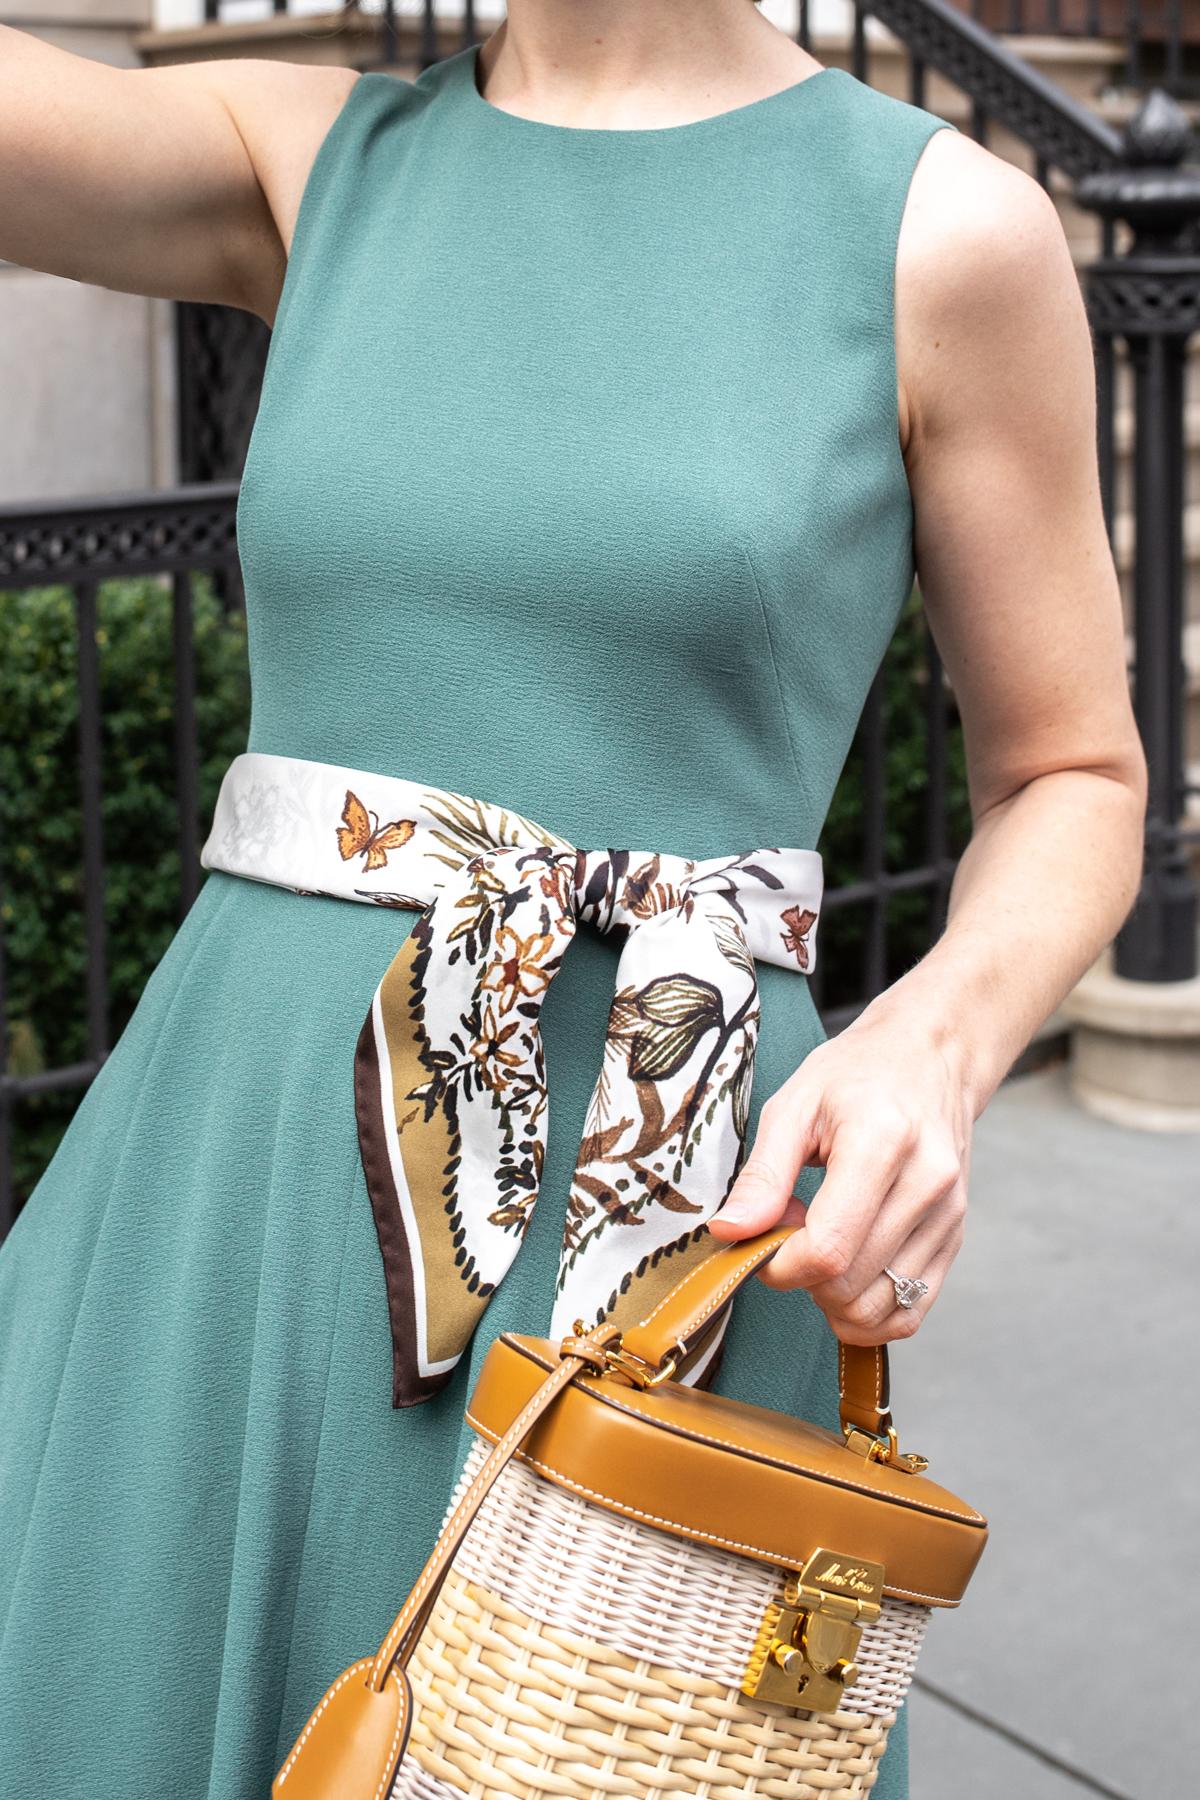 Stacie Flinner How to Style a Silk Scarf-28.jpg